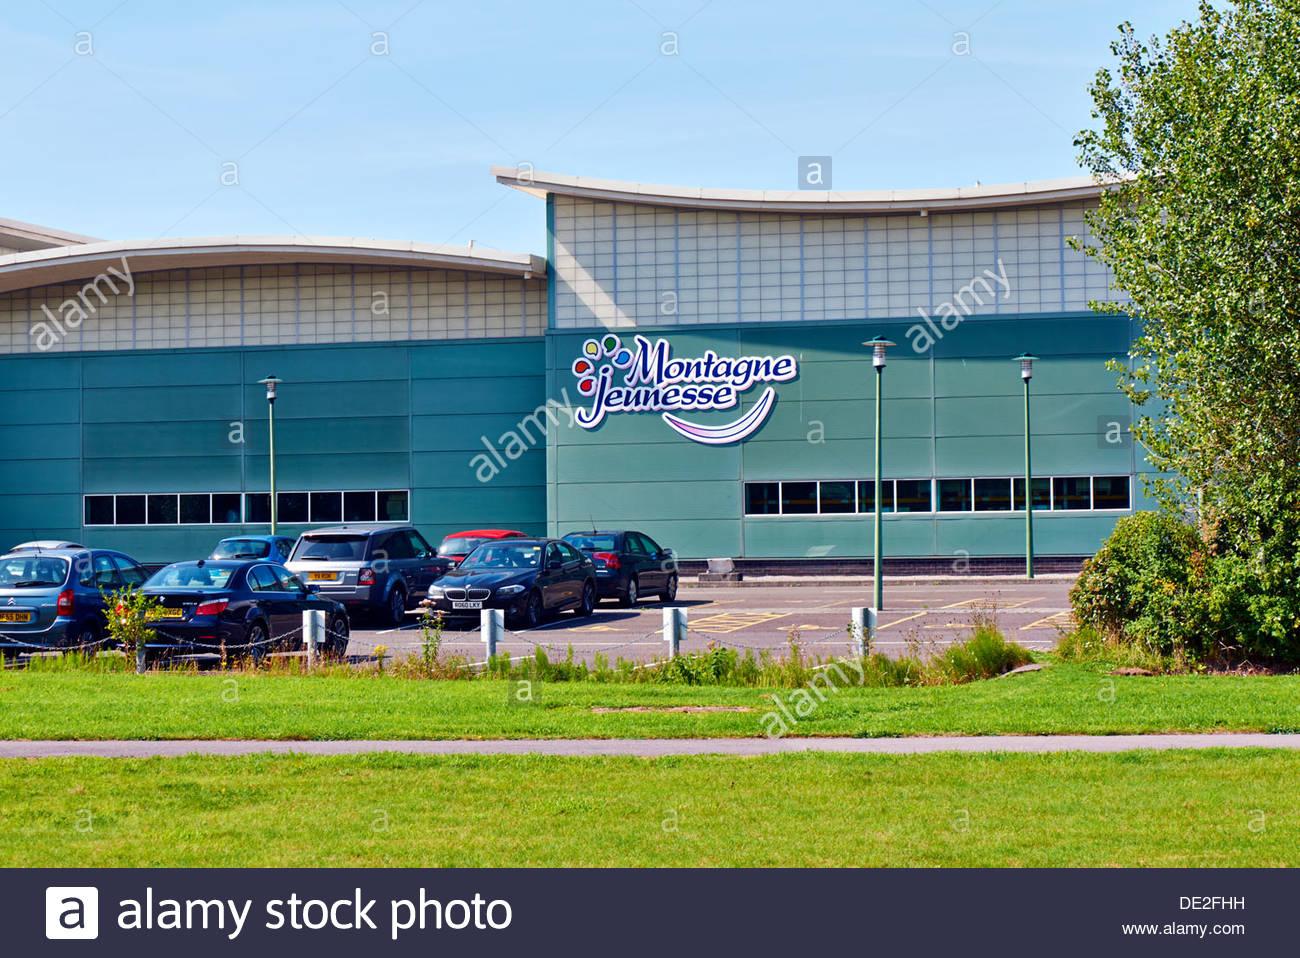 Il montagne jeunesse beauty product factory sulla baia di Baglan Energy Park, vicino a port talbot South wales uk Immagini Stock